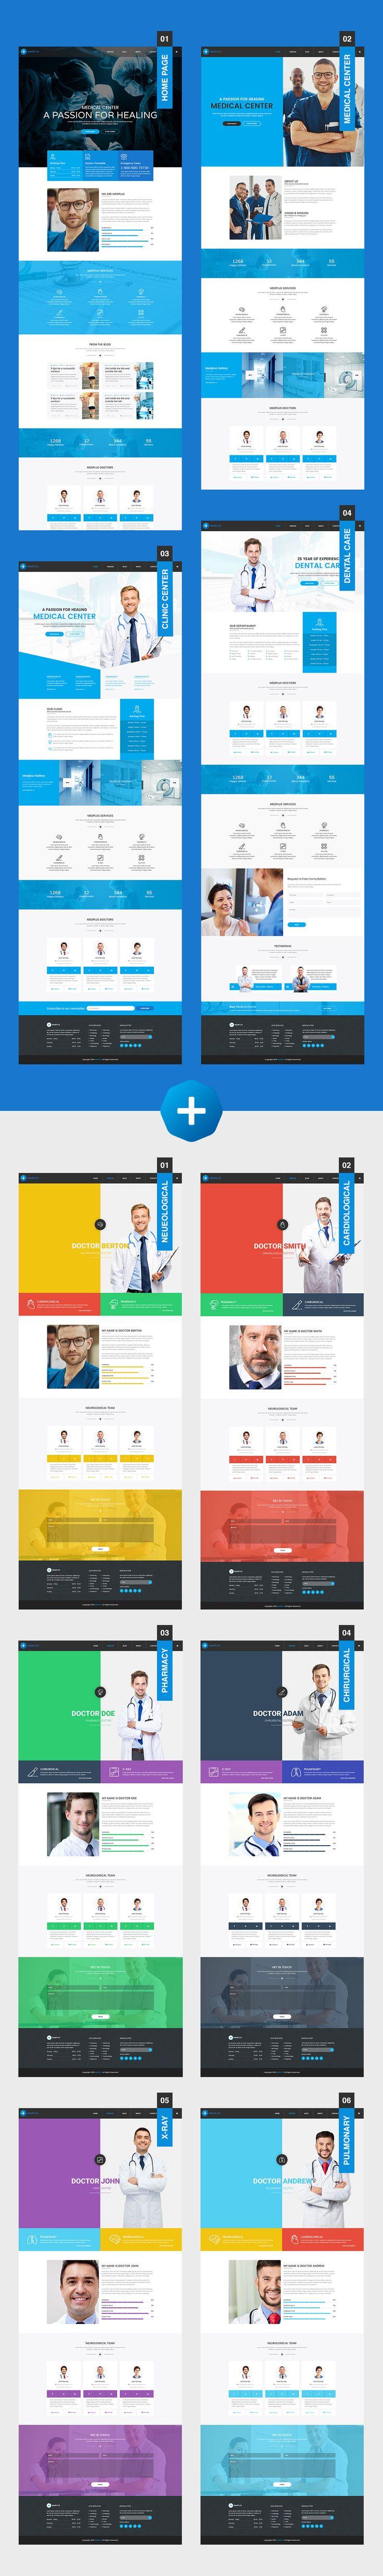 MedPlus – Medical & Health WordPress Theme by modeltheme   ThemeForest